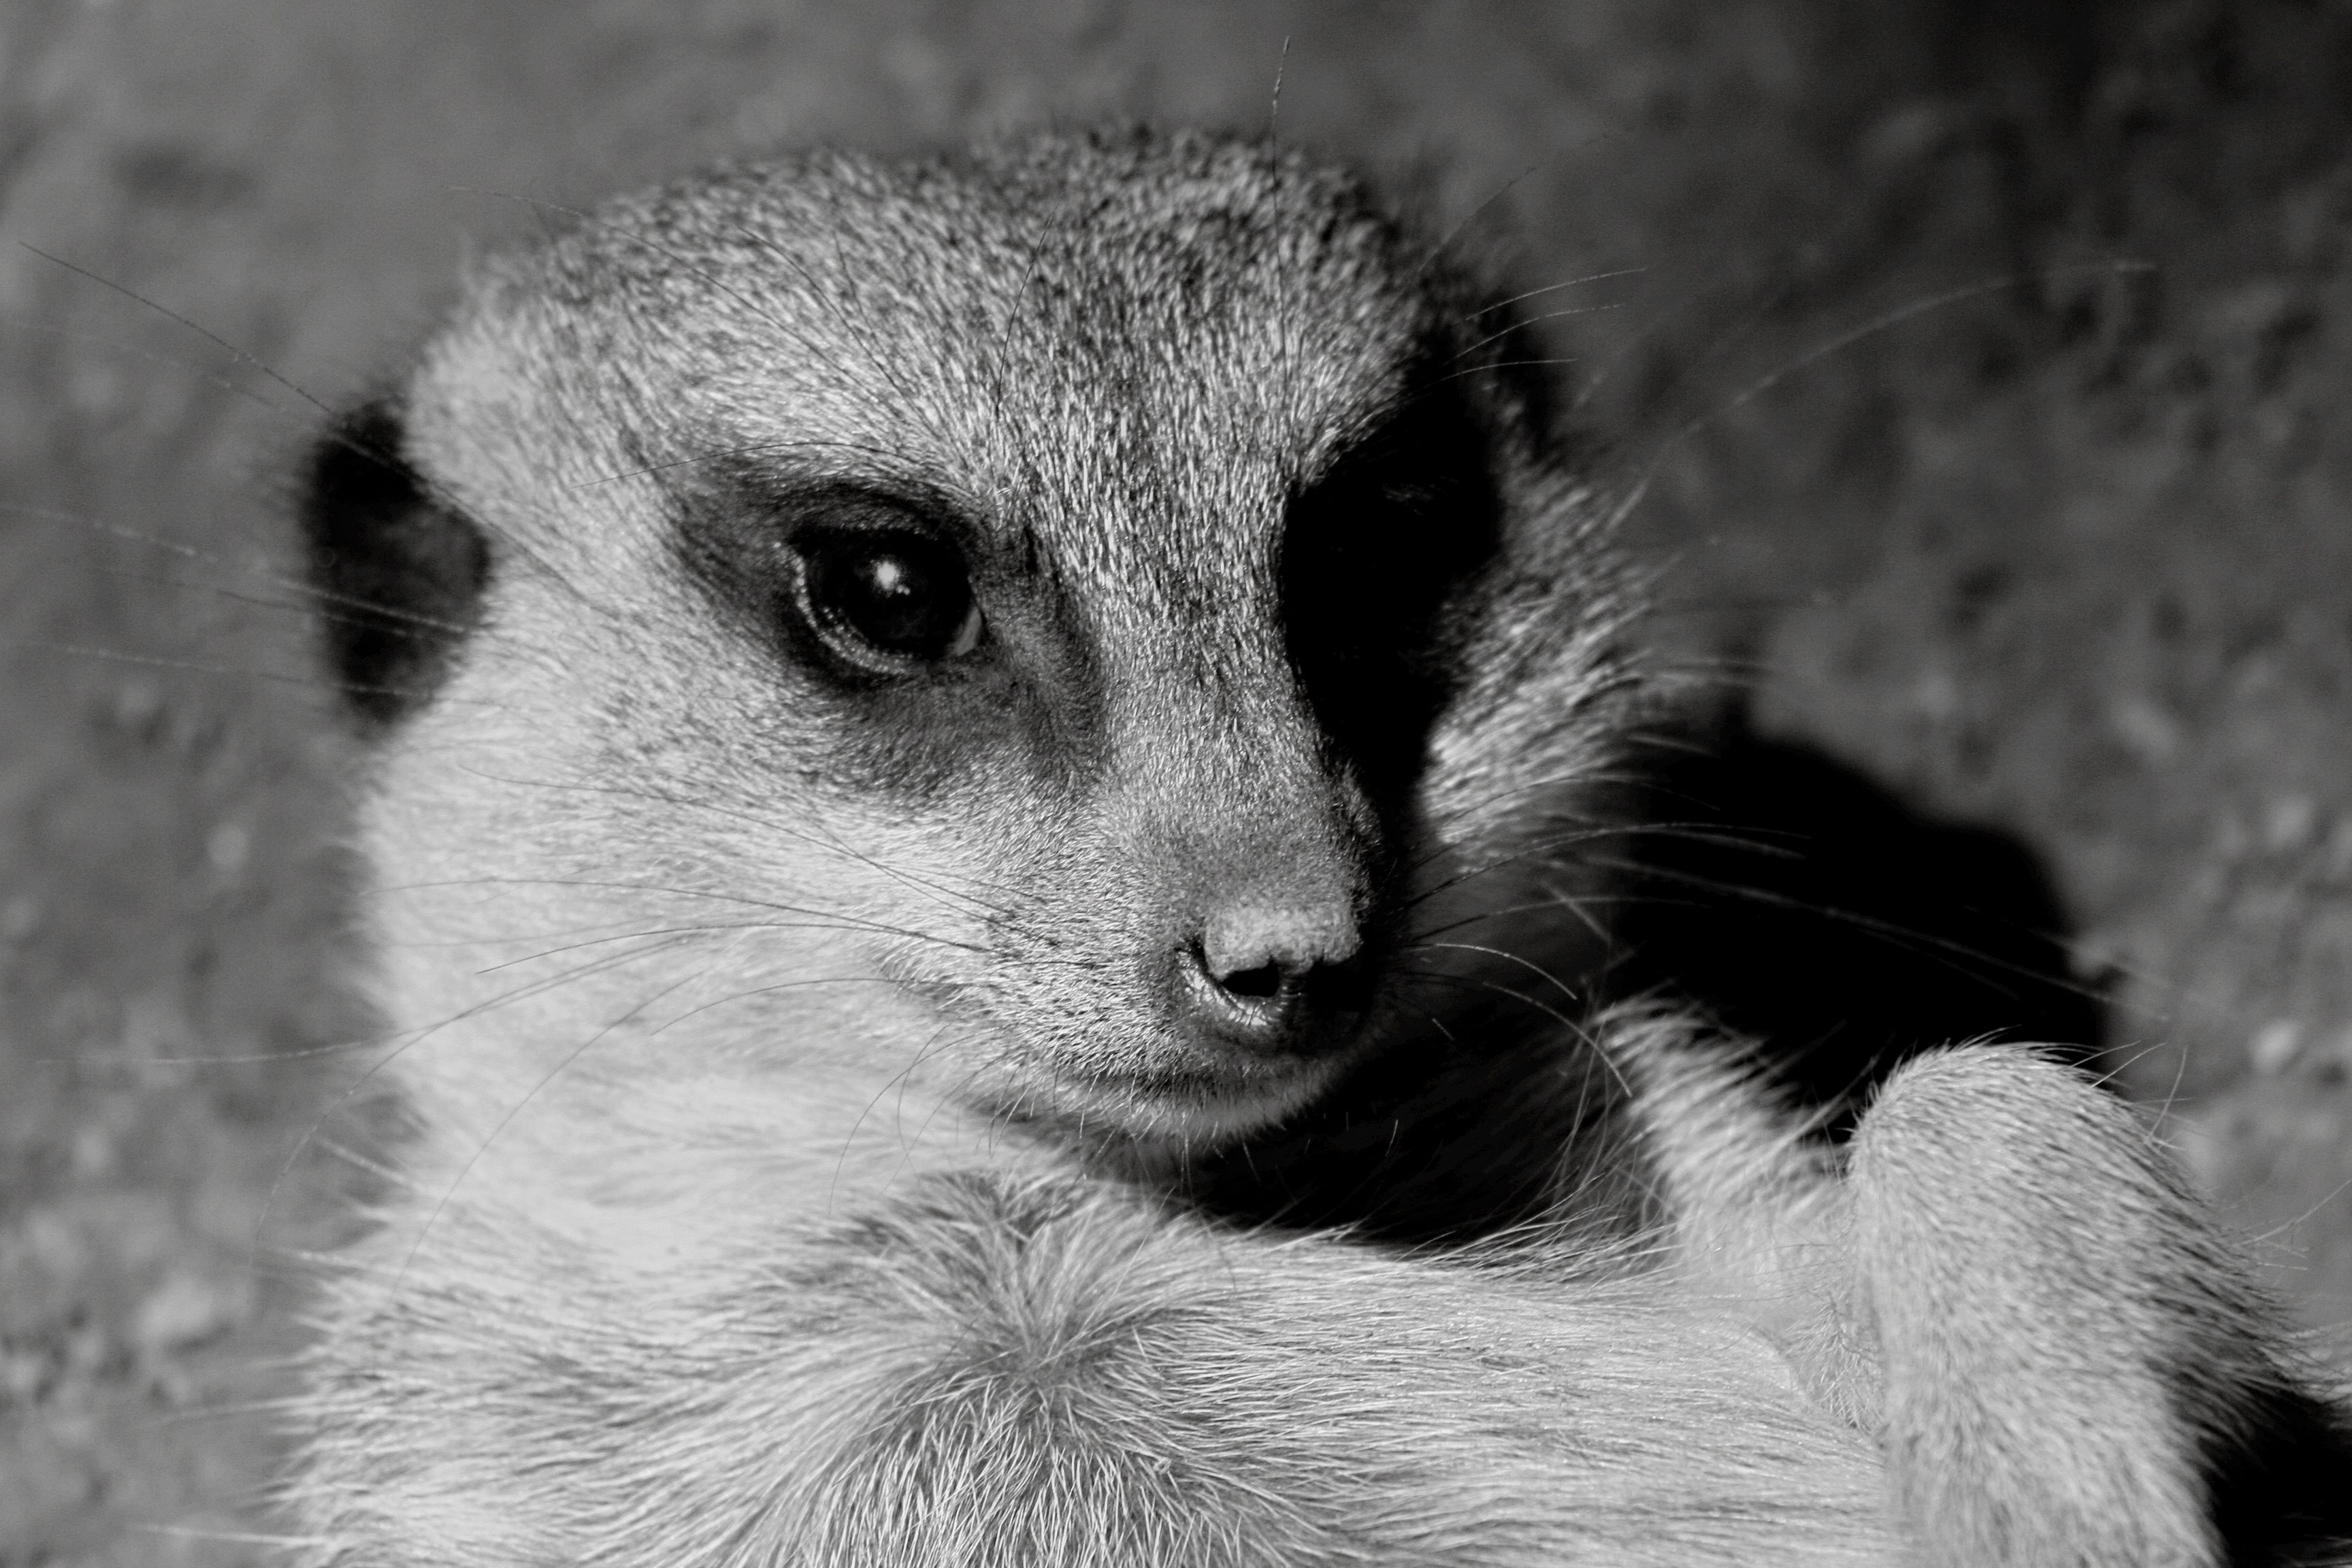 Grassmere zoo nashville tn by janis barnes zoo